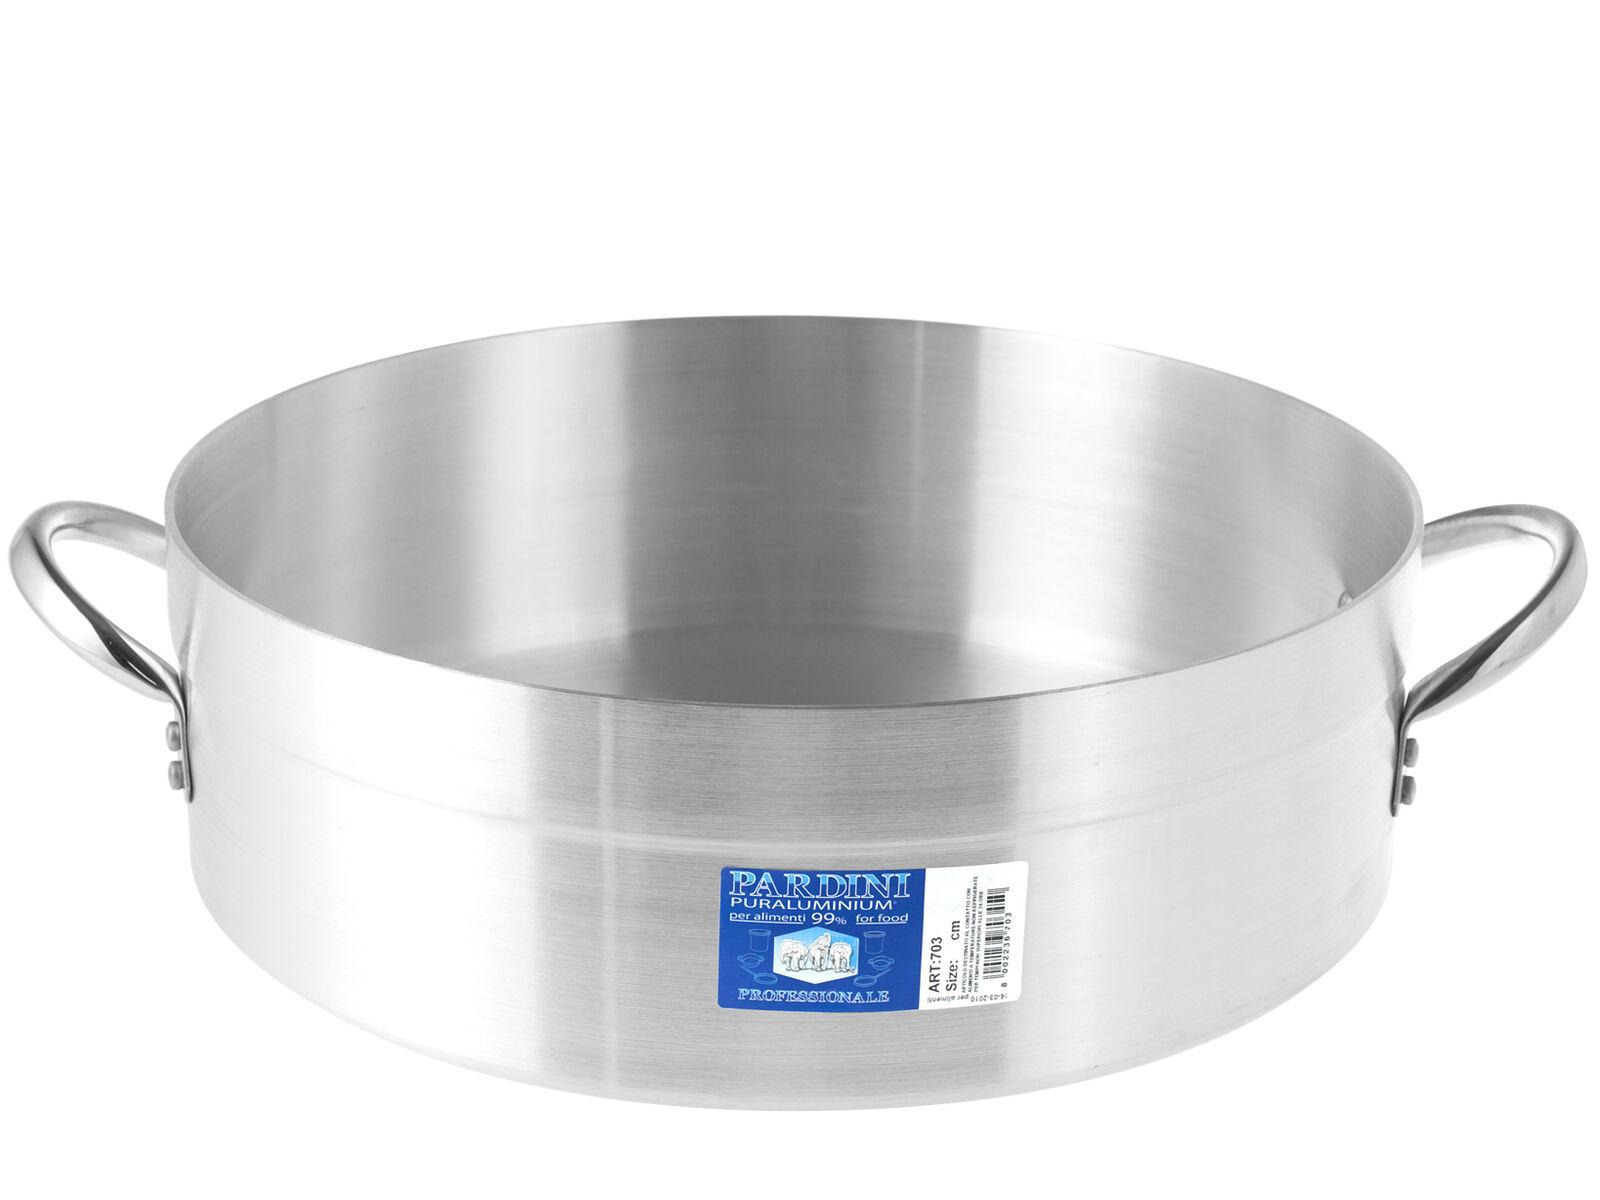 PARDINI Casseruola alluminio bassa albergo 2 manici 12 pentola da cucina